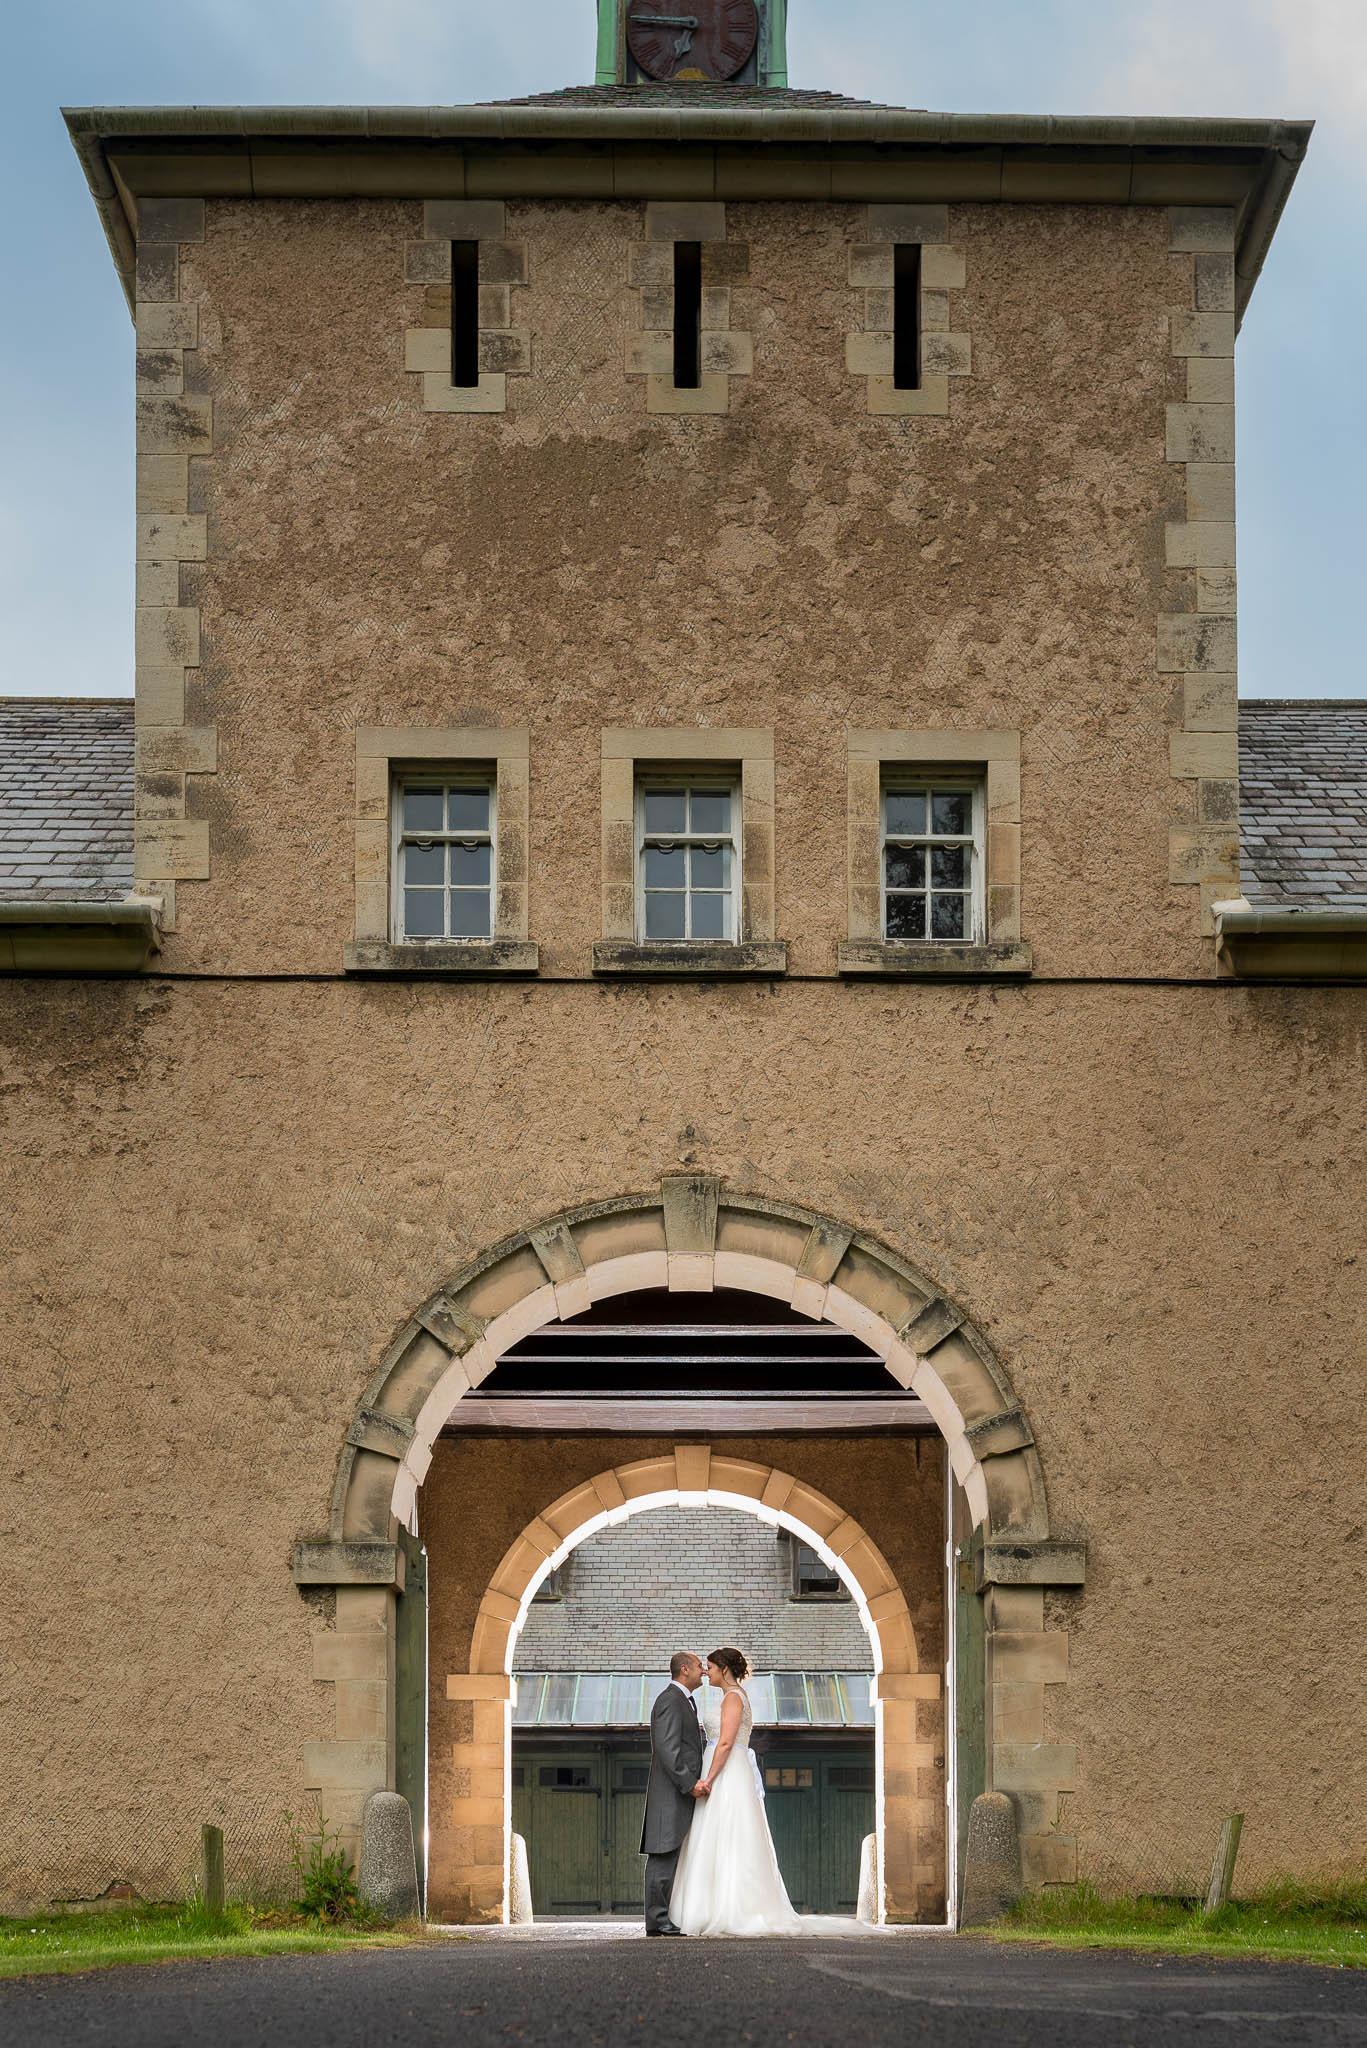 Crathorne Hall Hotel Wedding Photographer85.jpg